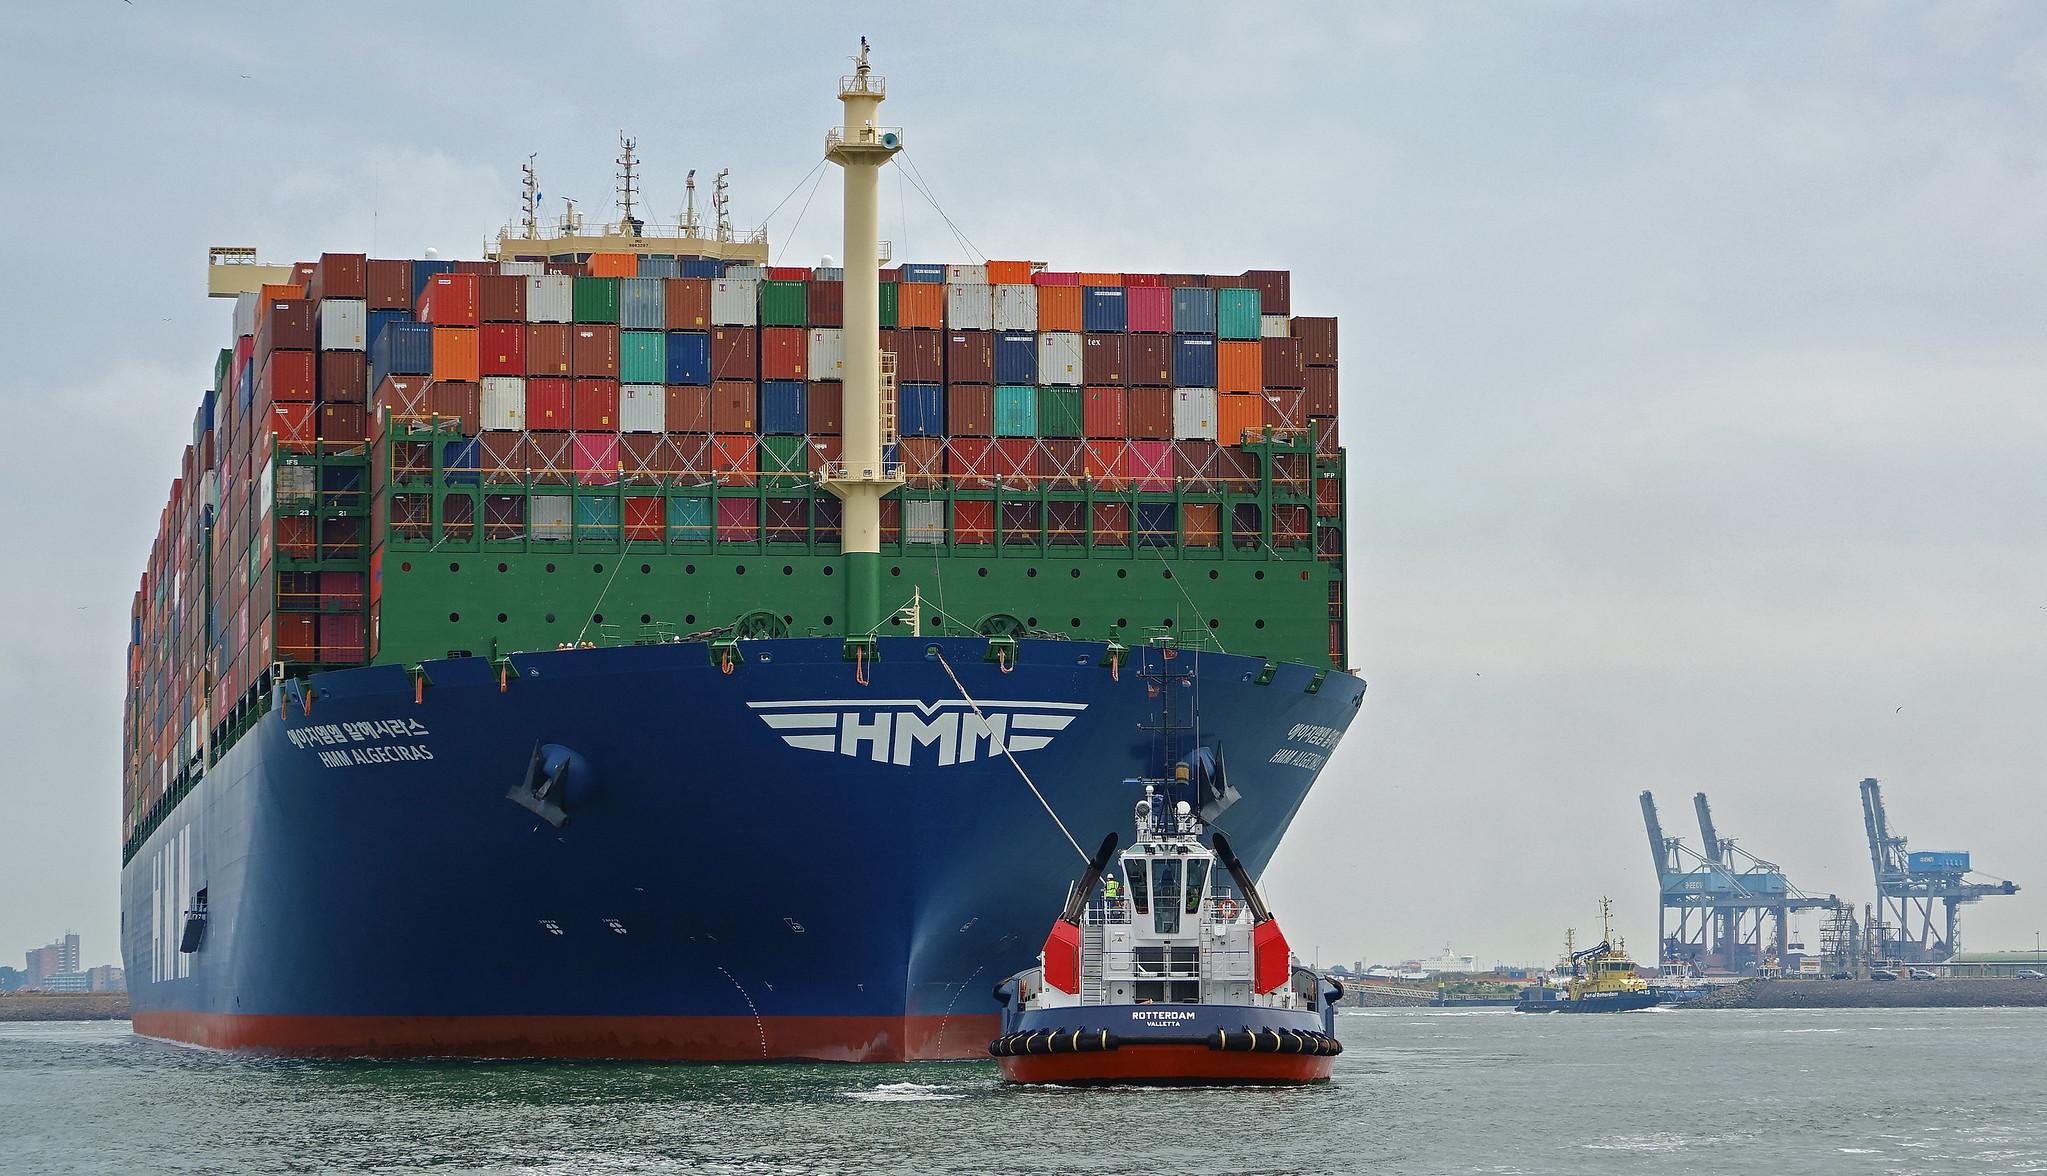 HMM orders twelve 13,000 TEU container ships